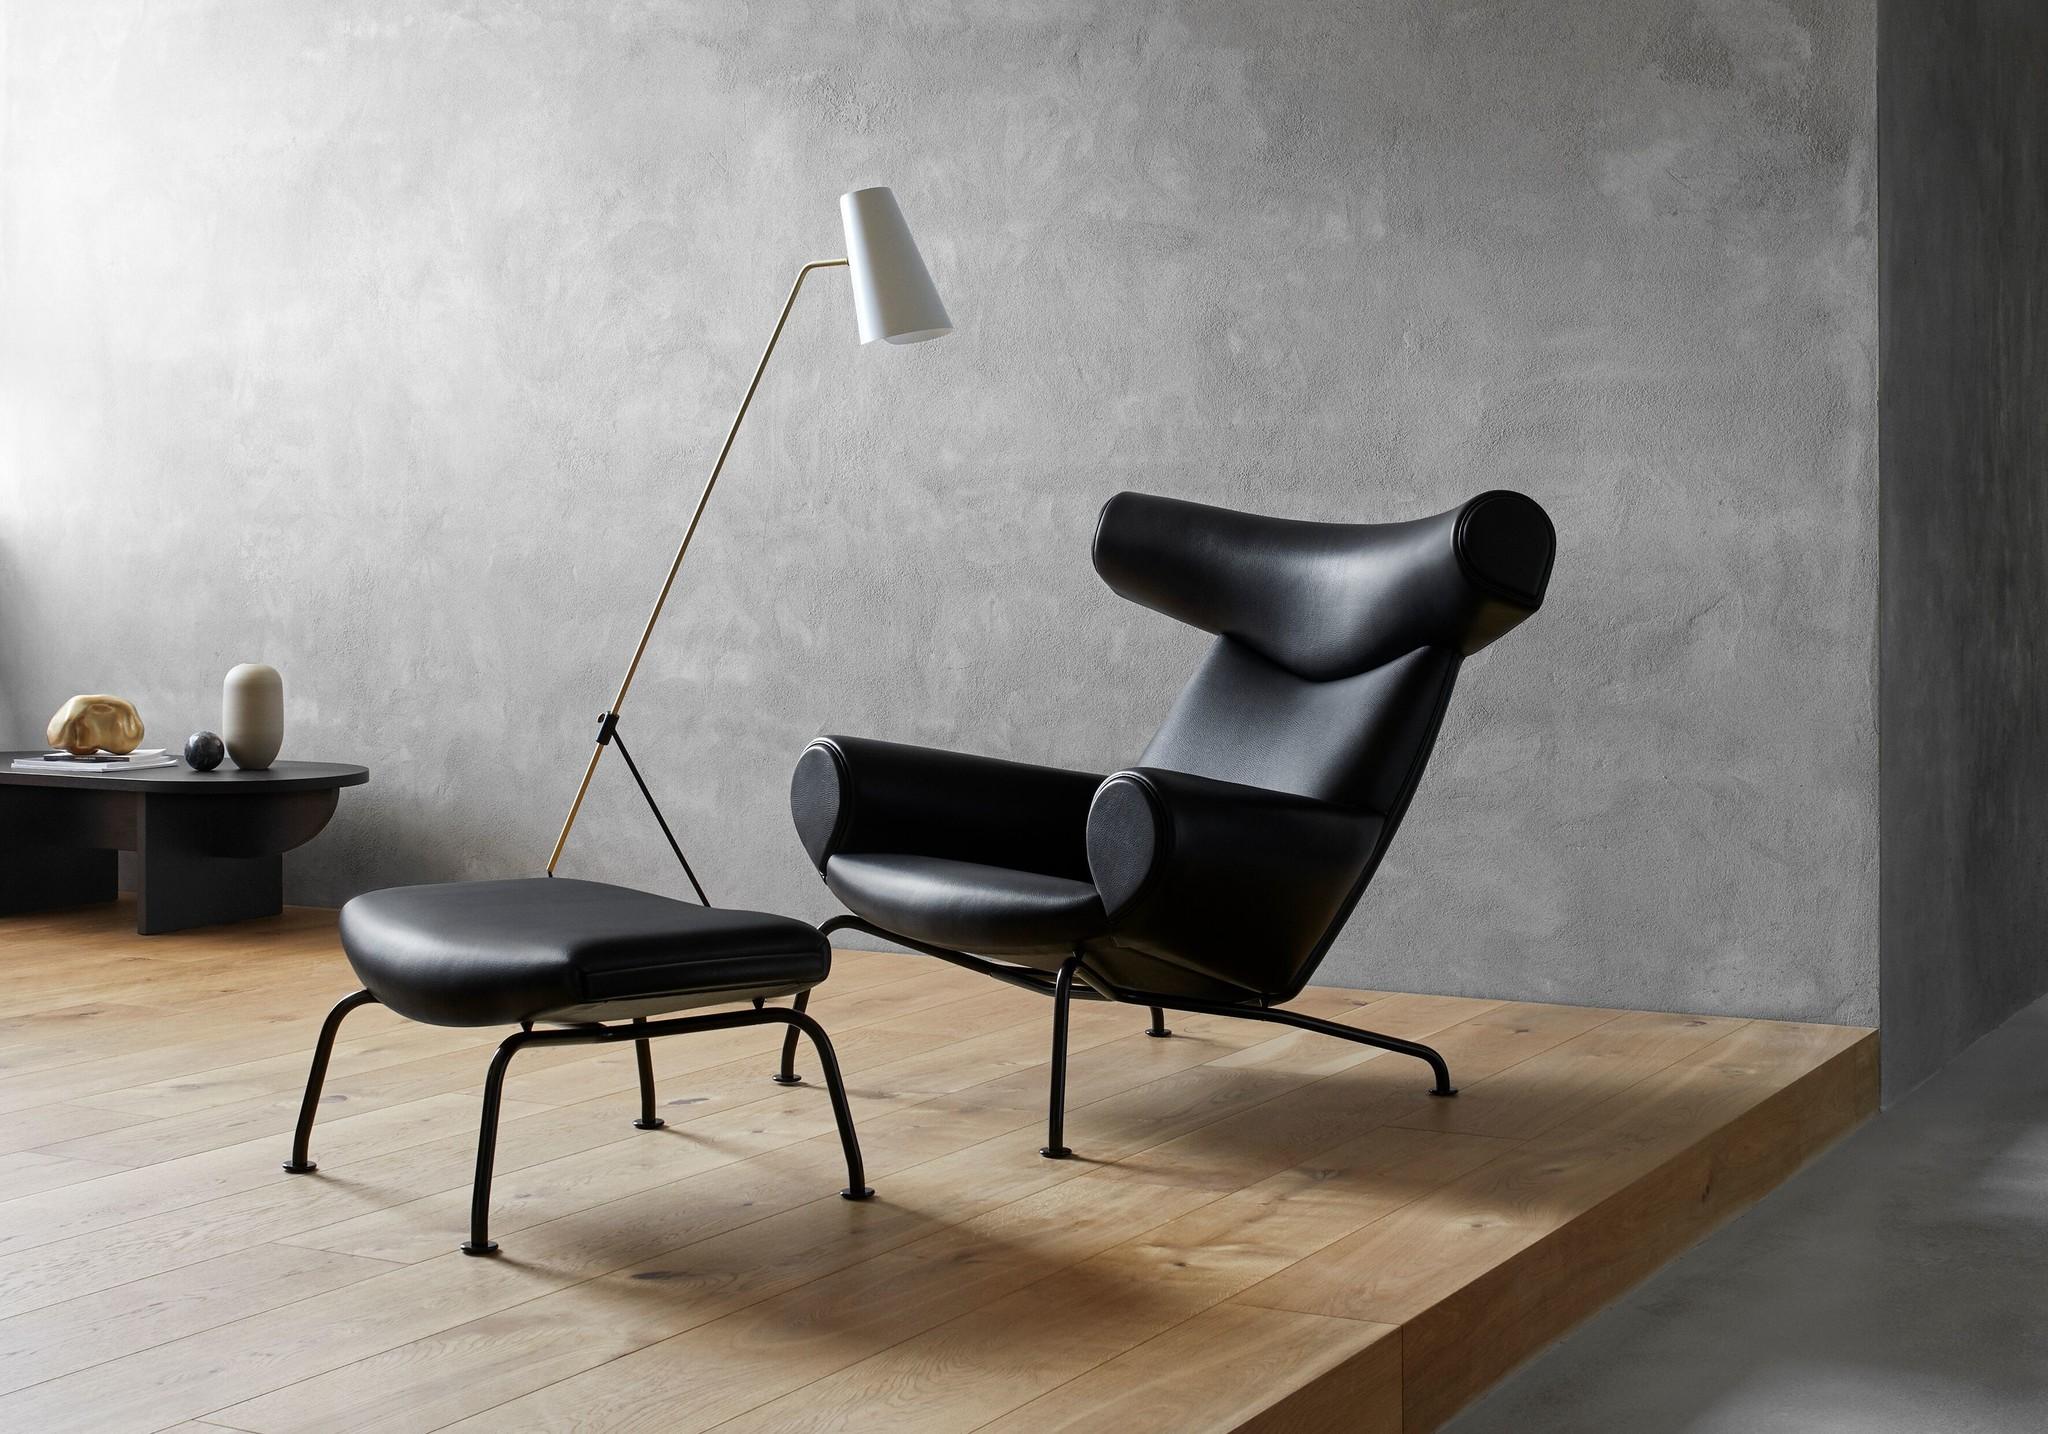 Design Stoel Lounge.Erik Jorgensen Ox Chair Lounge Stoel Design Online Meubels